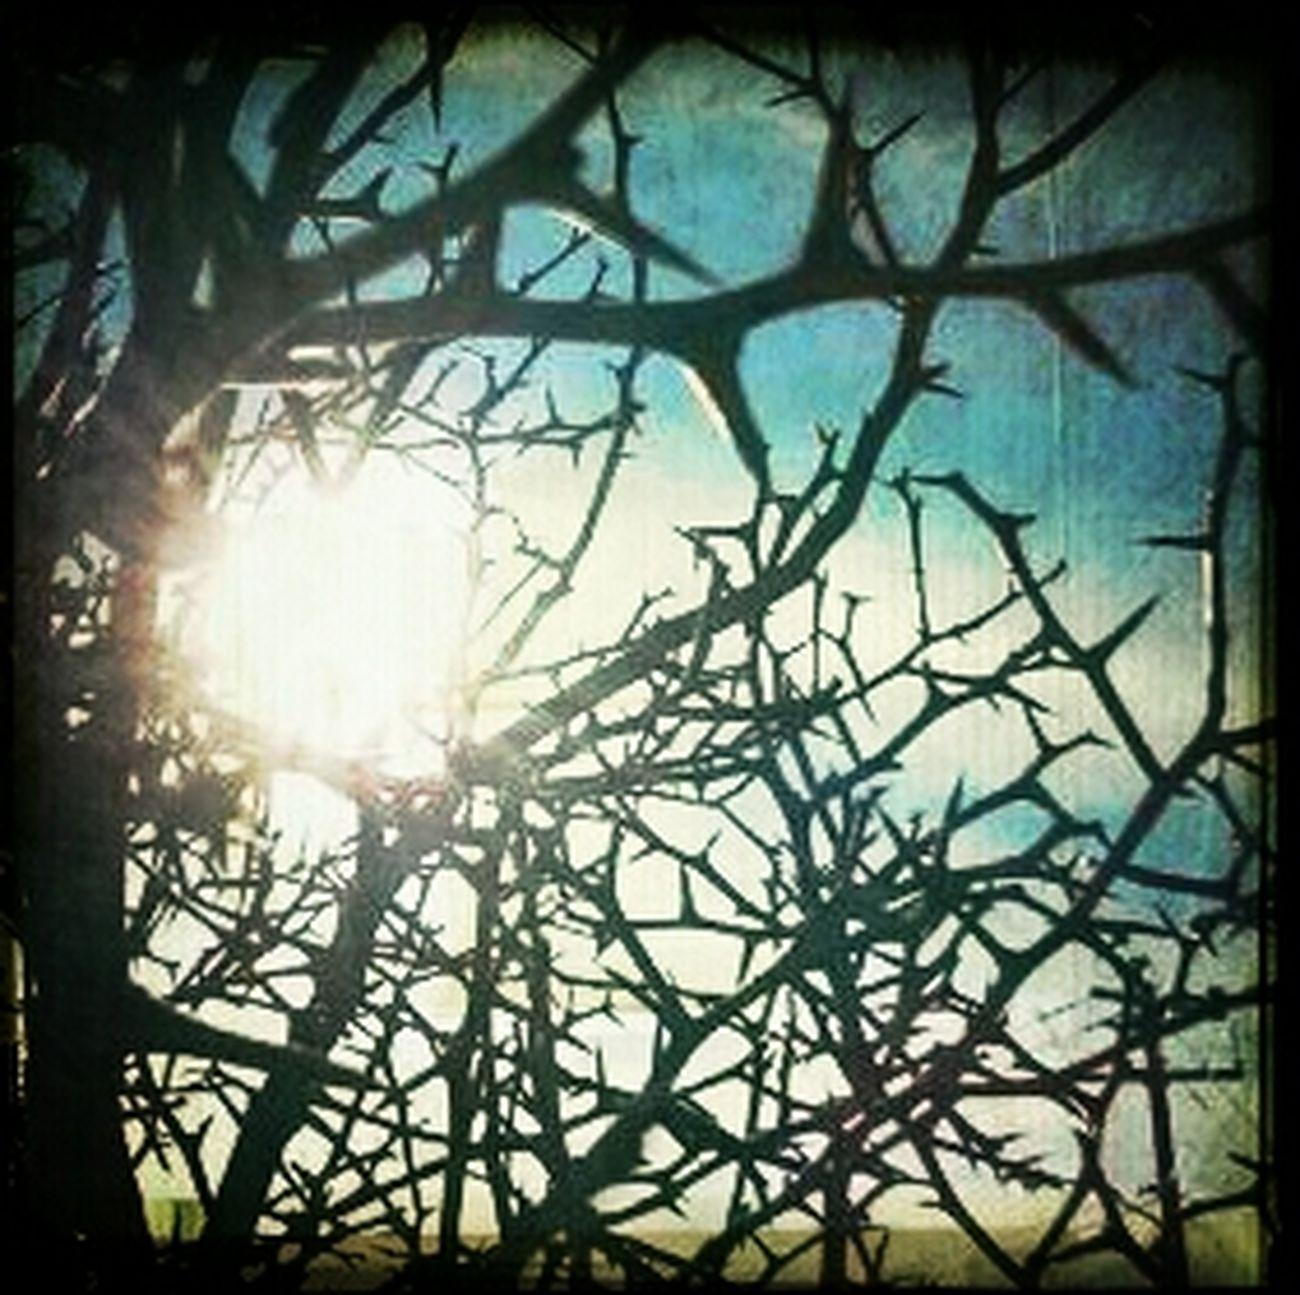 Thorny Prickly Thorns Under The Kumquat Bush Pricks